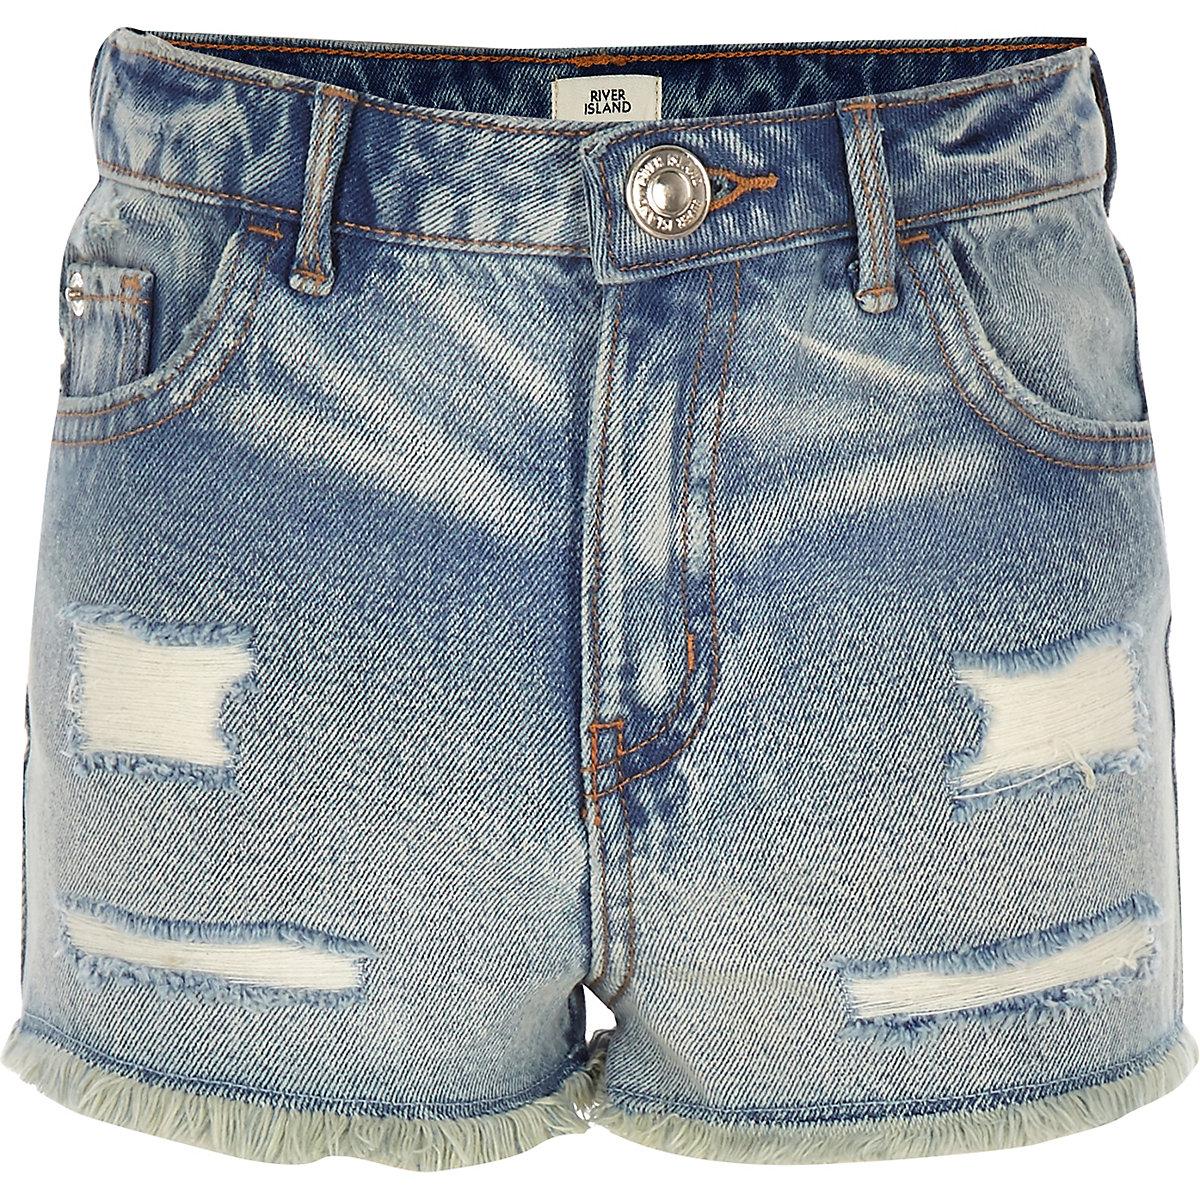 Girls blue Annie acid wash high rise shorts